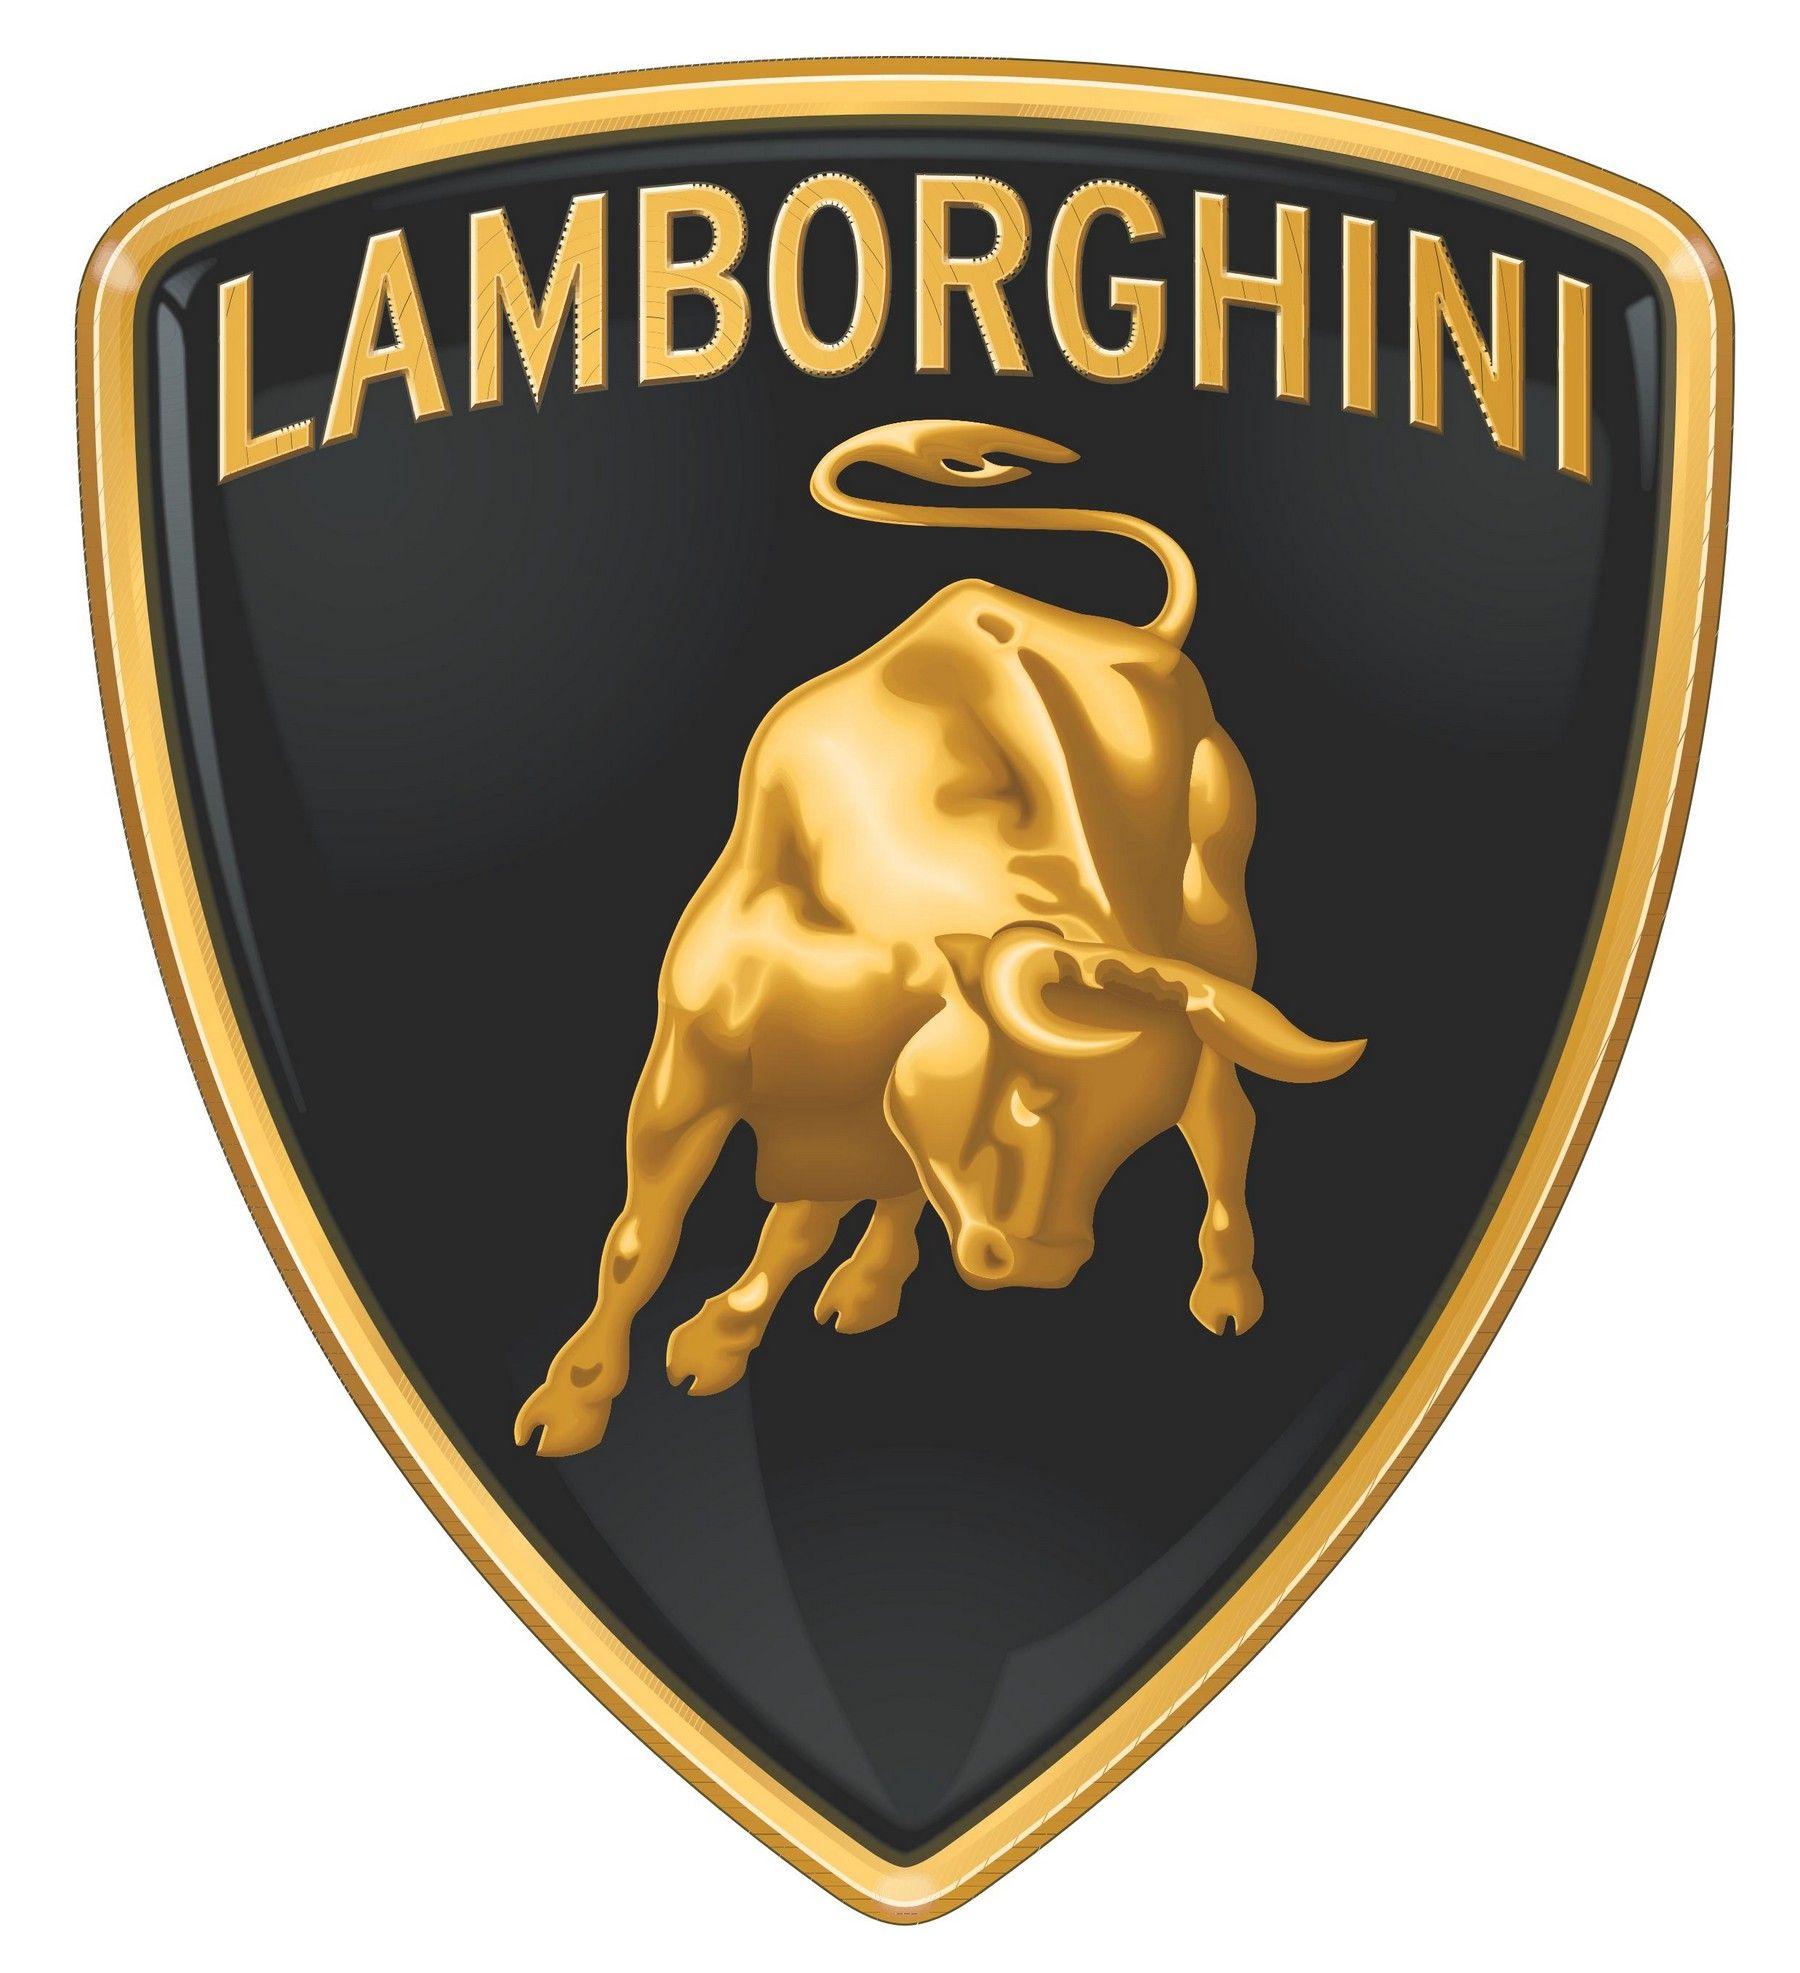 Lamborghini Logo Eps Pdf Vector Eps Free Download Logo Icons Brand Emblems Lamborghini Logo Lamborghini Cars Car Logos